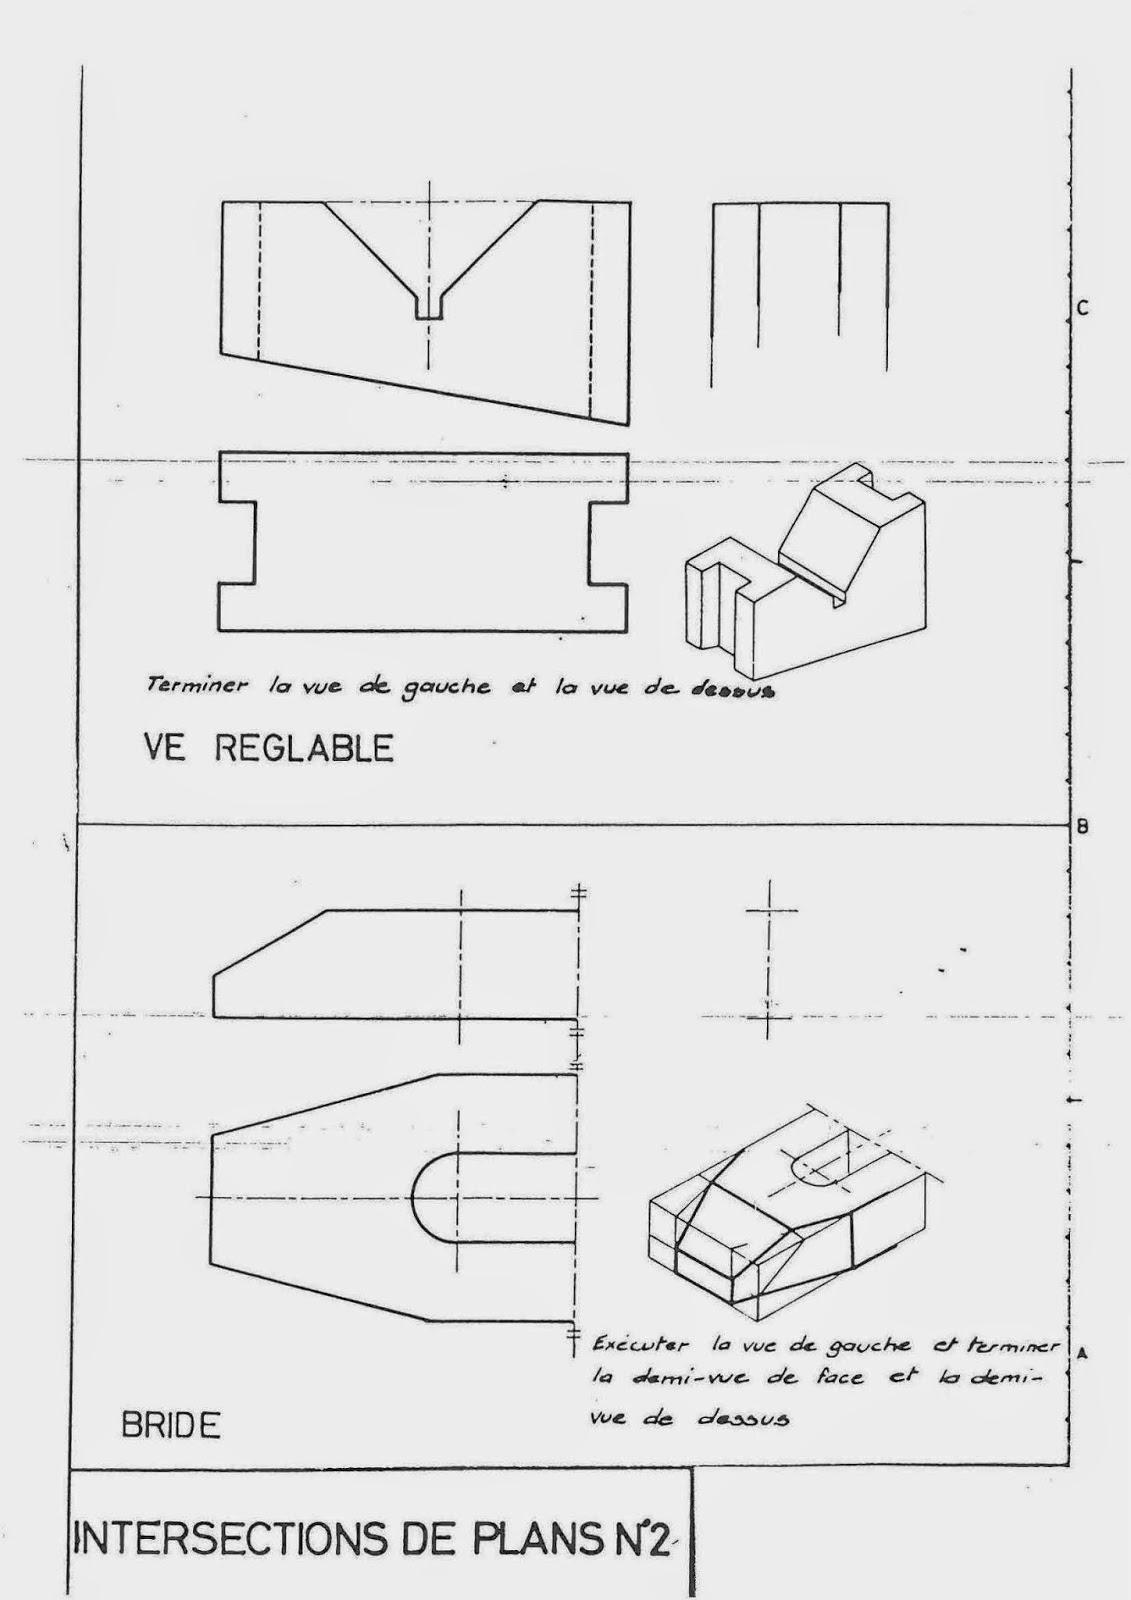 http://cimic.csbe.qc.ca/index.php/dessin-industriel